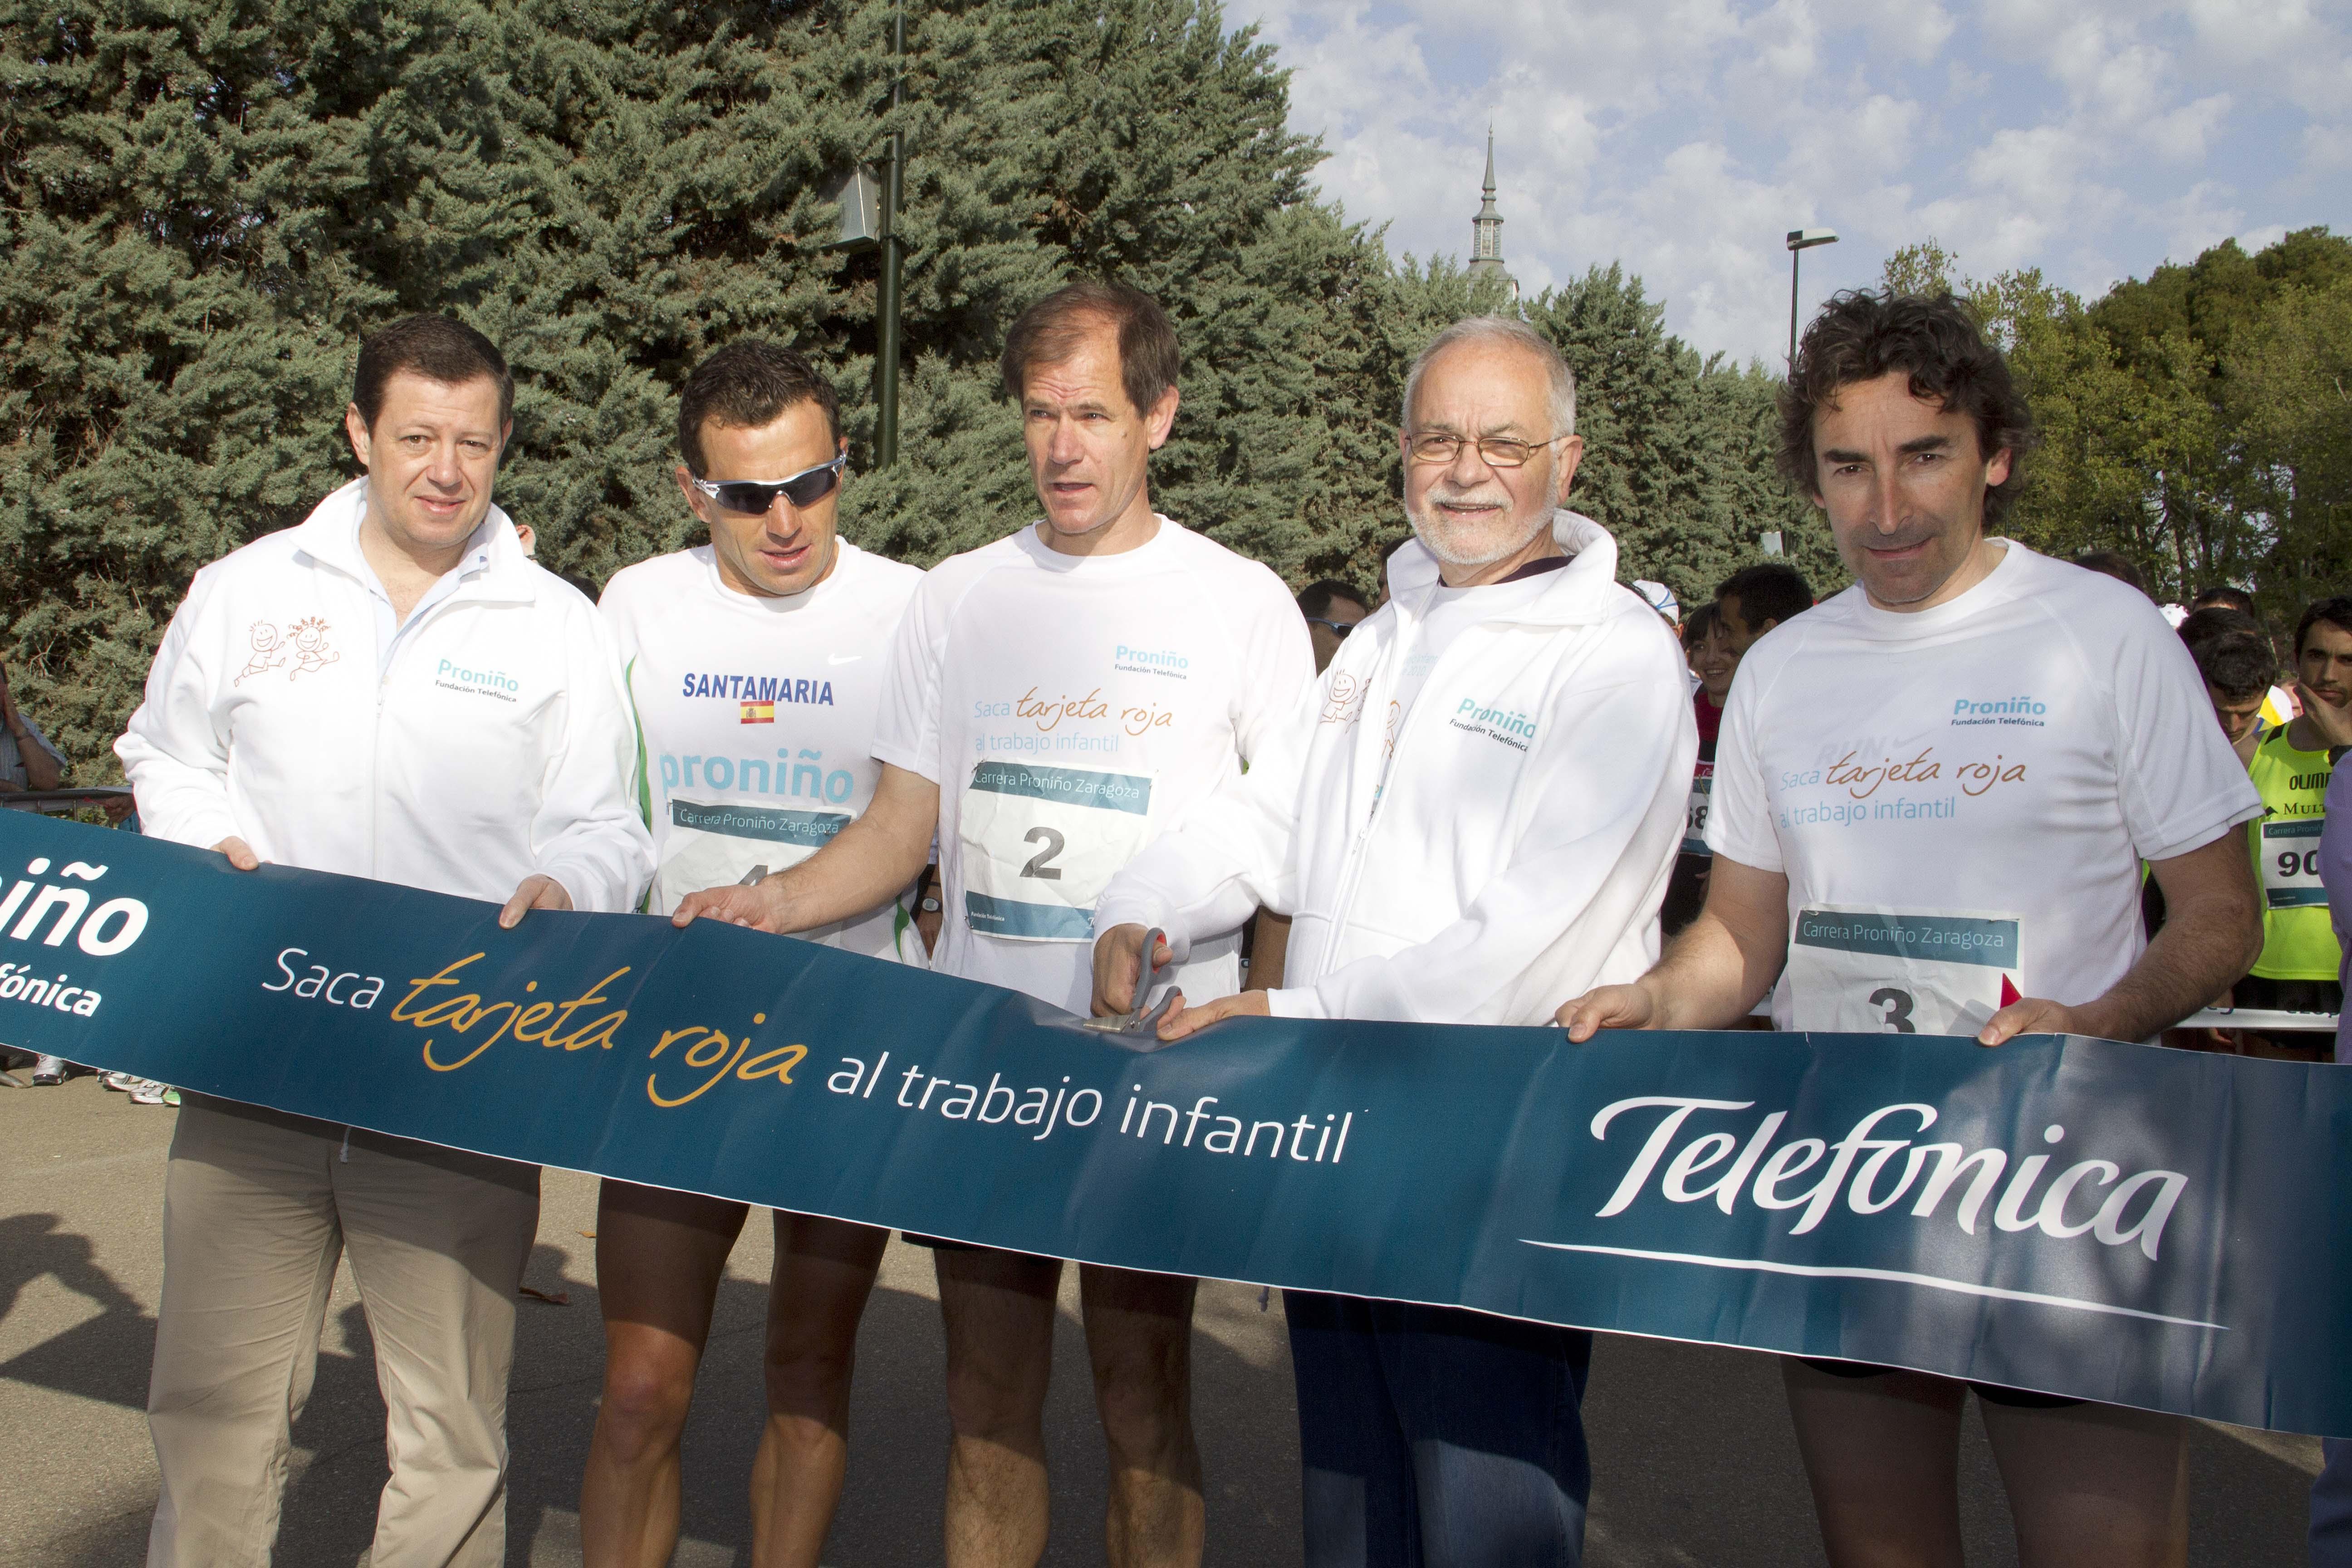 De izquierda a derecha: Federico Tartón,  Director de Telefónica en Aragón; Alejandro Santamaría, atleta; Abel Antón, atleta, Javier Nadal, Vicepresidente Ejecutivo de Fundación Telefónica; Fernando Escartín, ciclista.